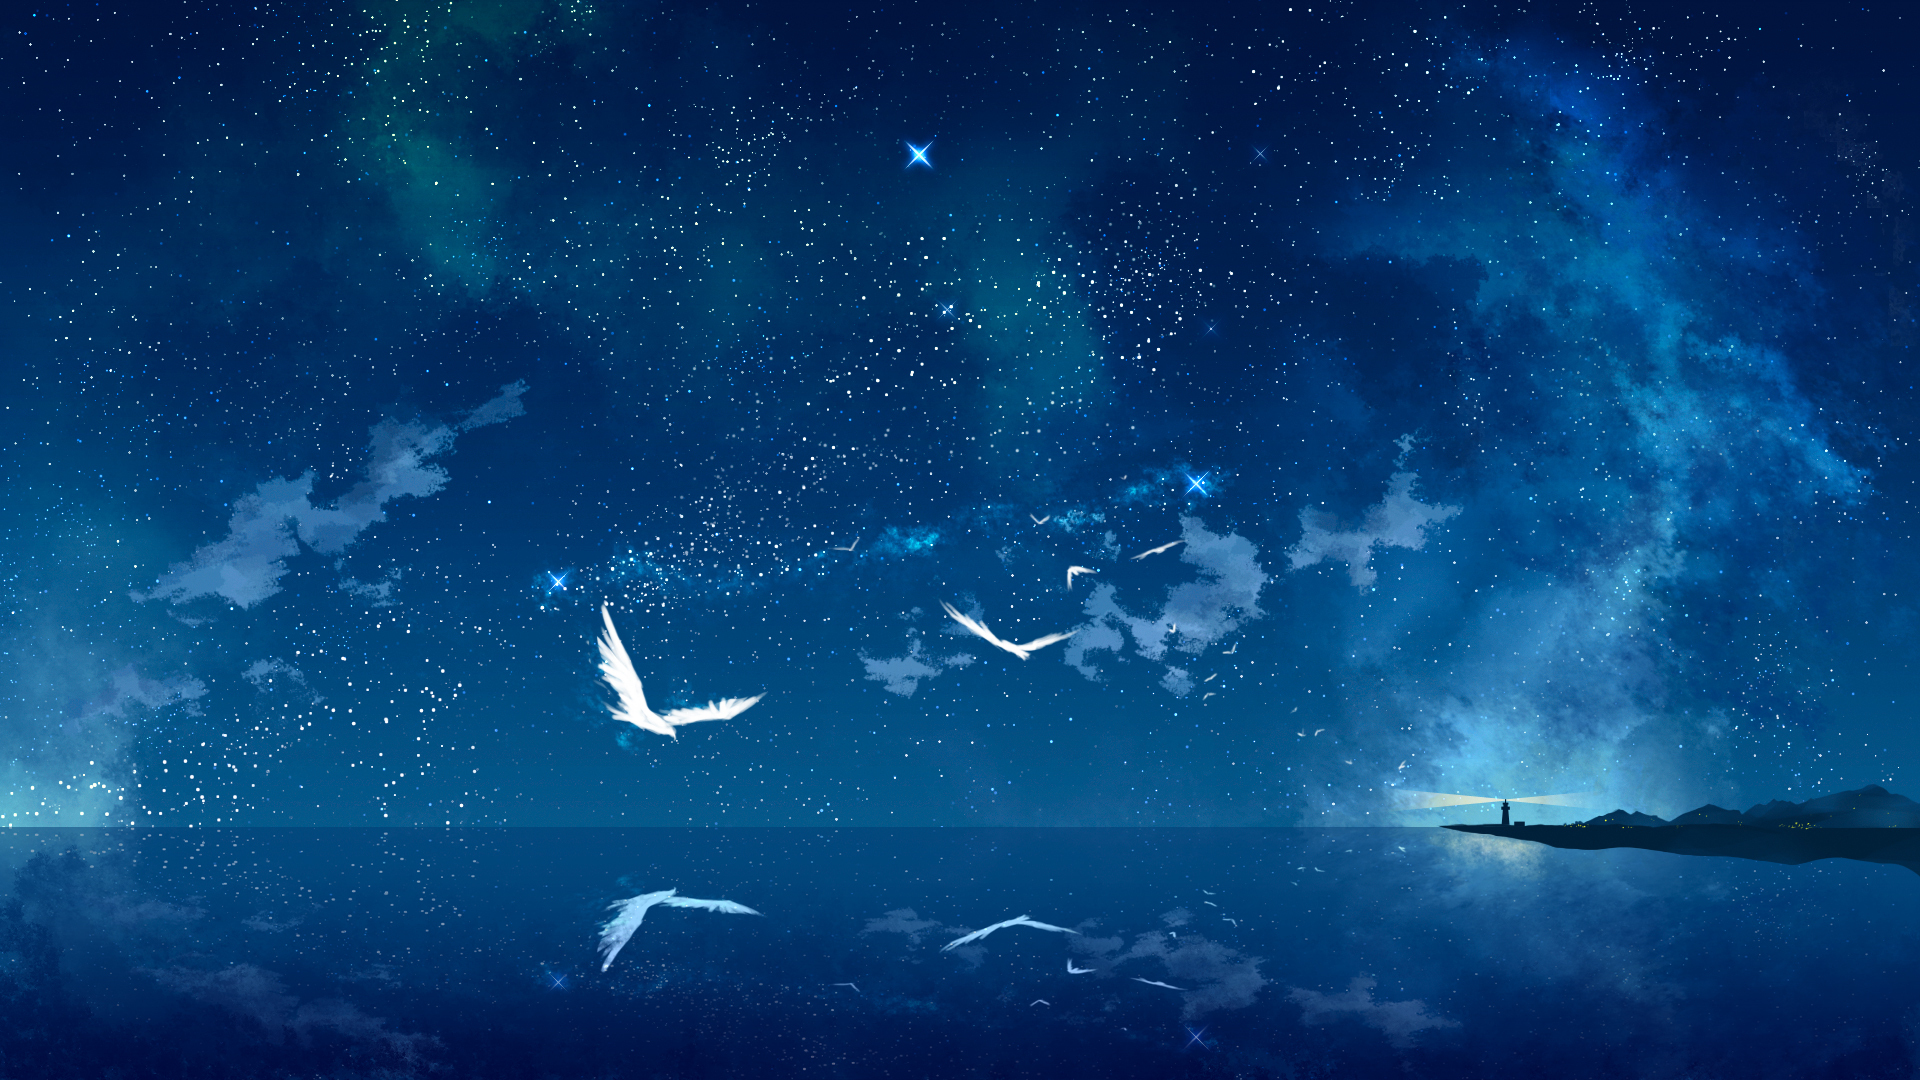 starry night sky wallpaper 1920x1080